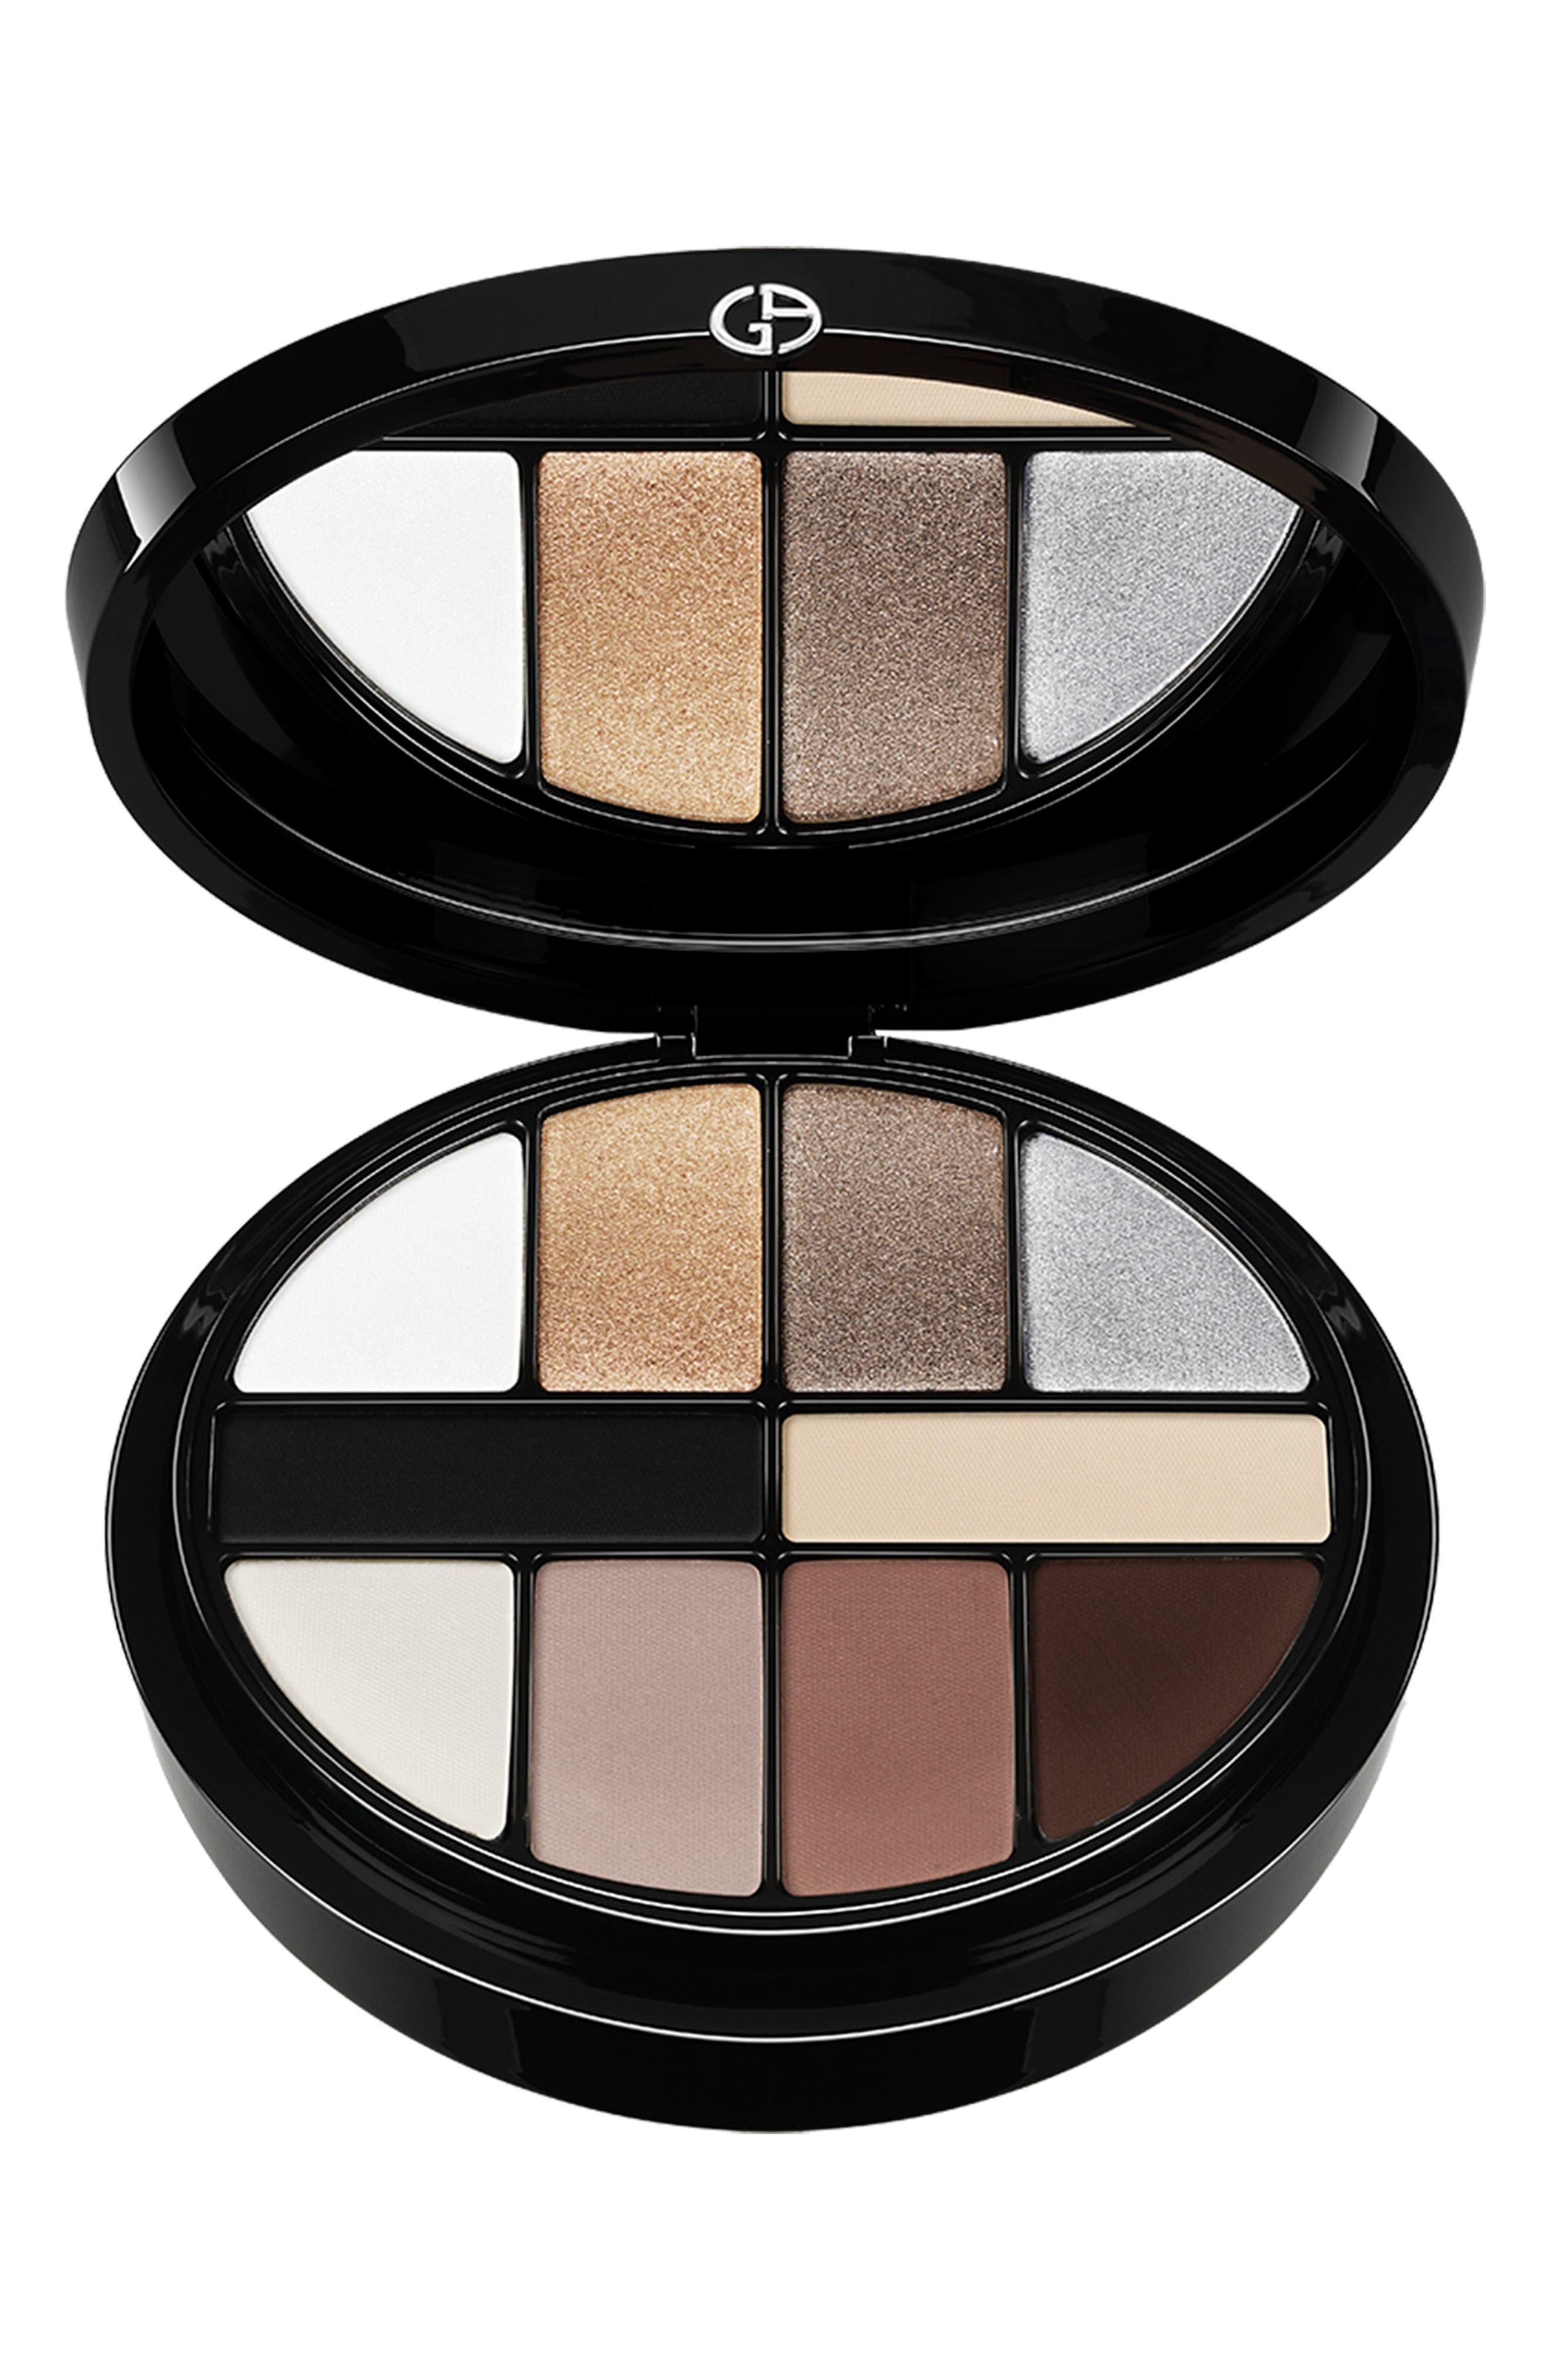 Alternate Image 1 Selected - Giorgio Armani La Mia Milano Eye and Face Makeup (Nordstrom Exclusive)